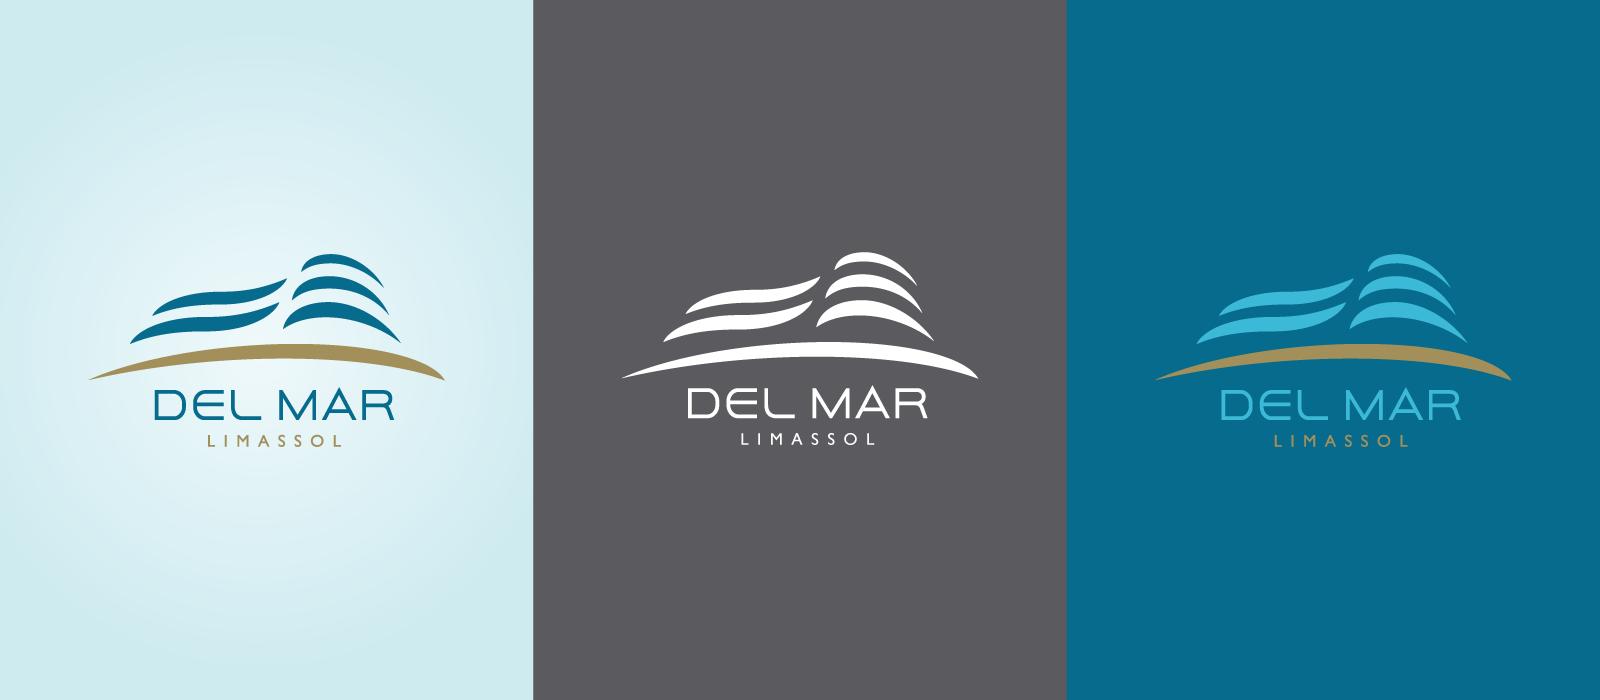 dm-logo_02a.png